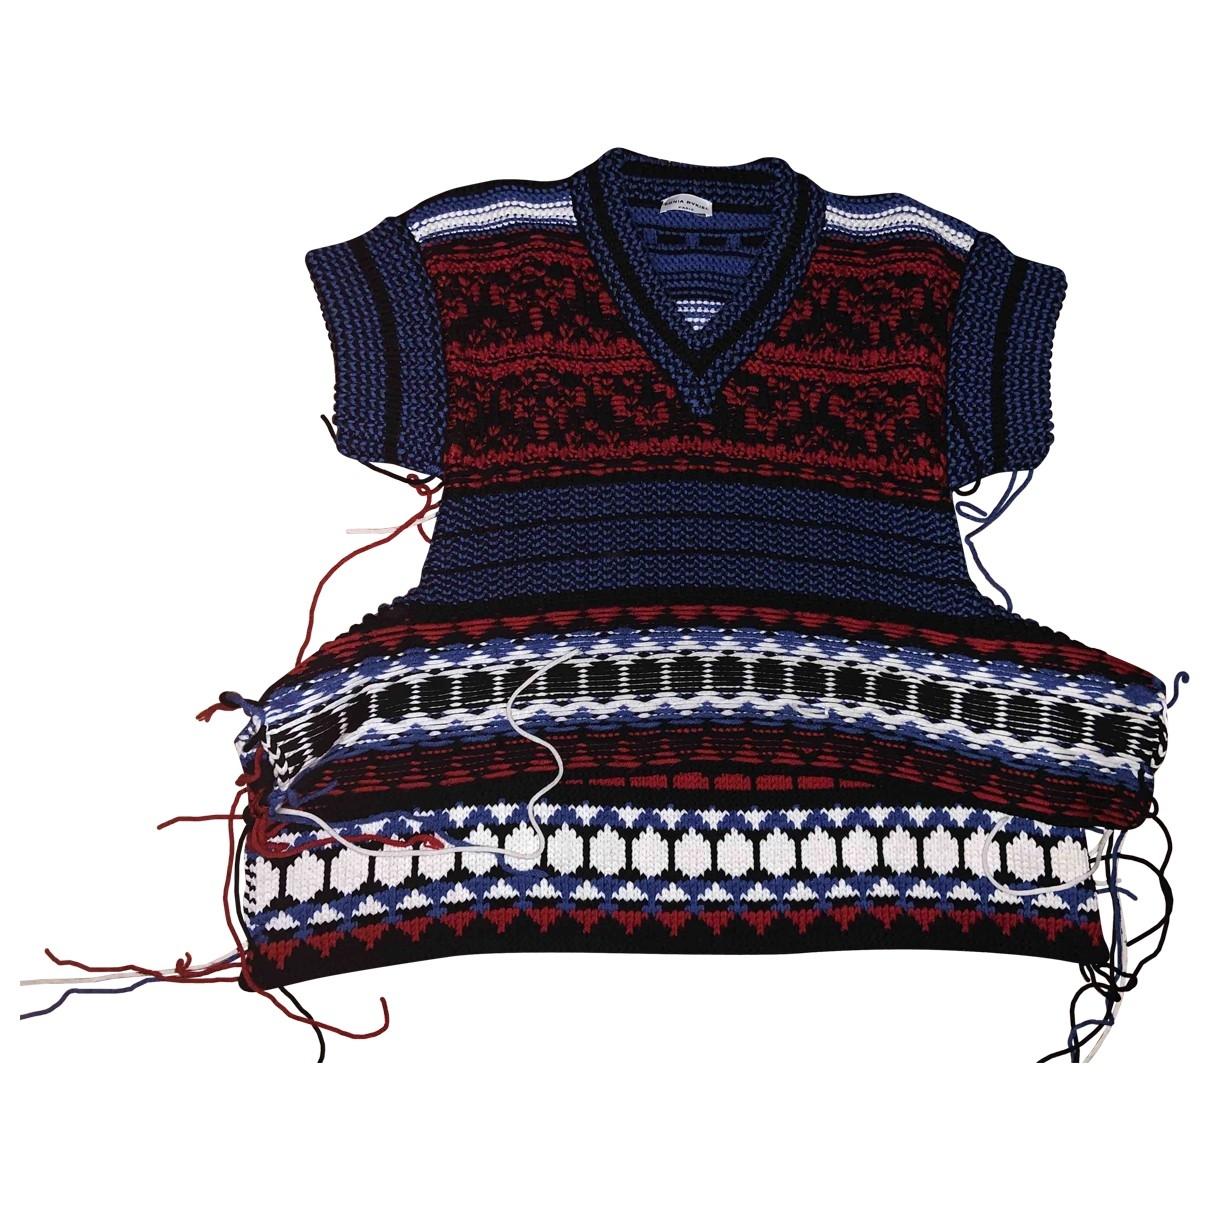 Sonia Rykiel - Pull   pour femme en laine - bleu